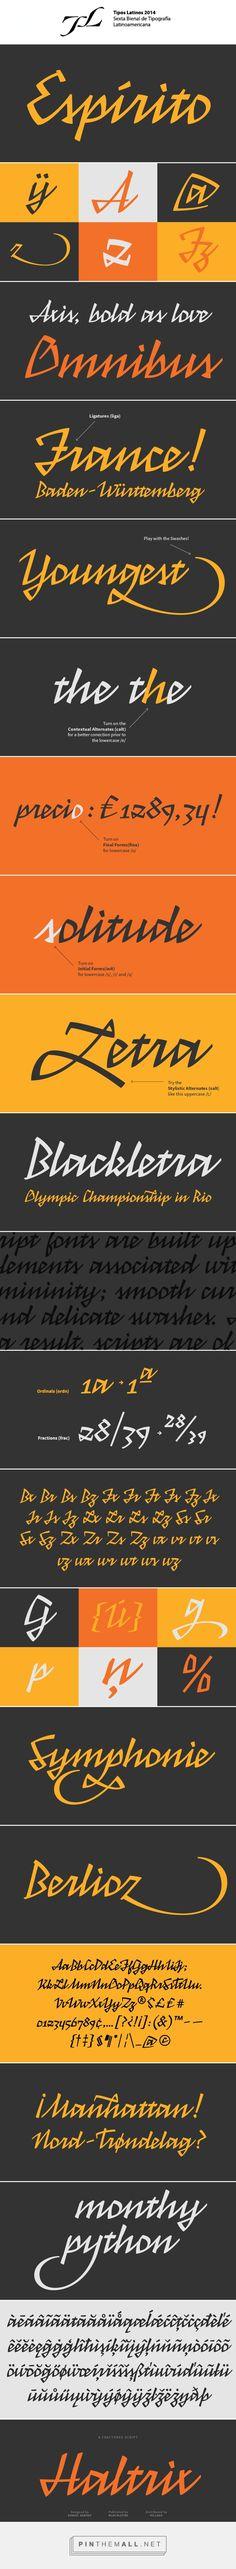 Typeface Haltrix on Behance